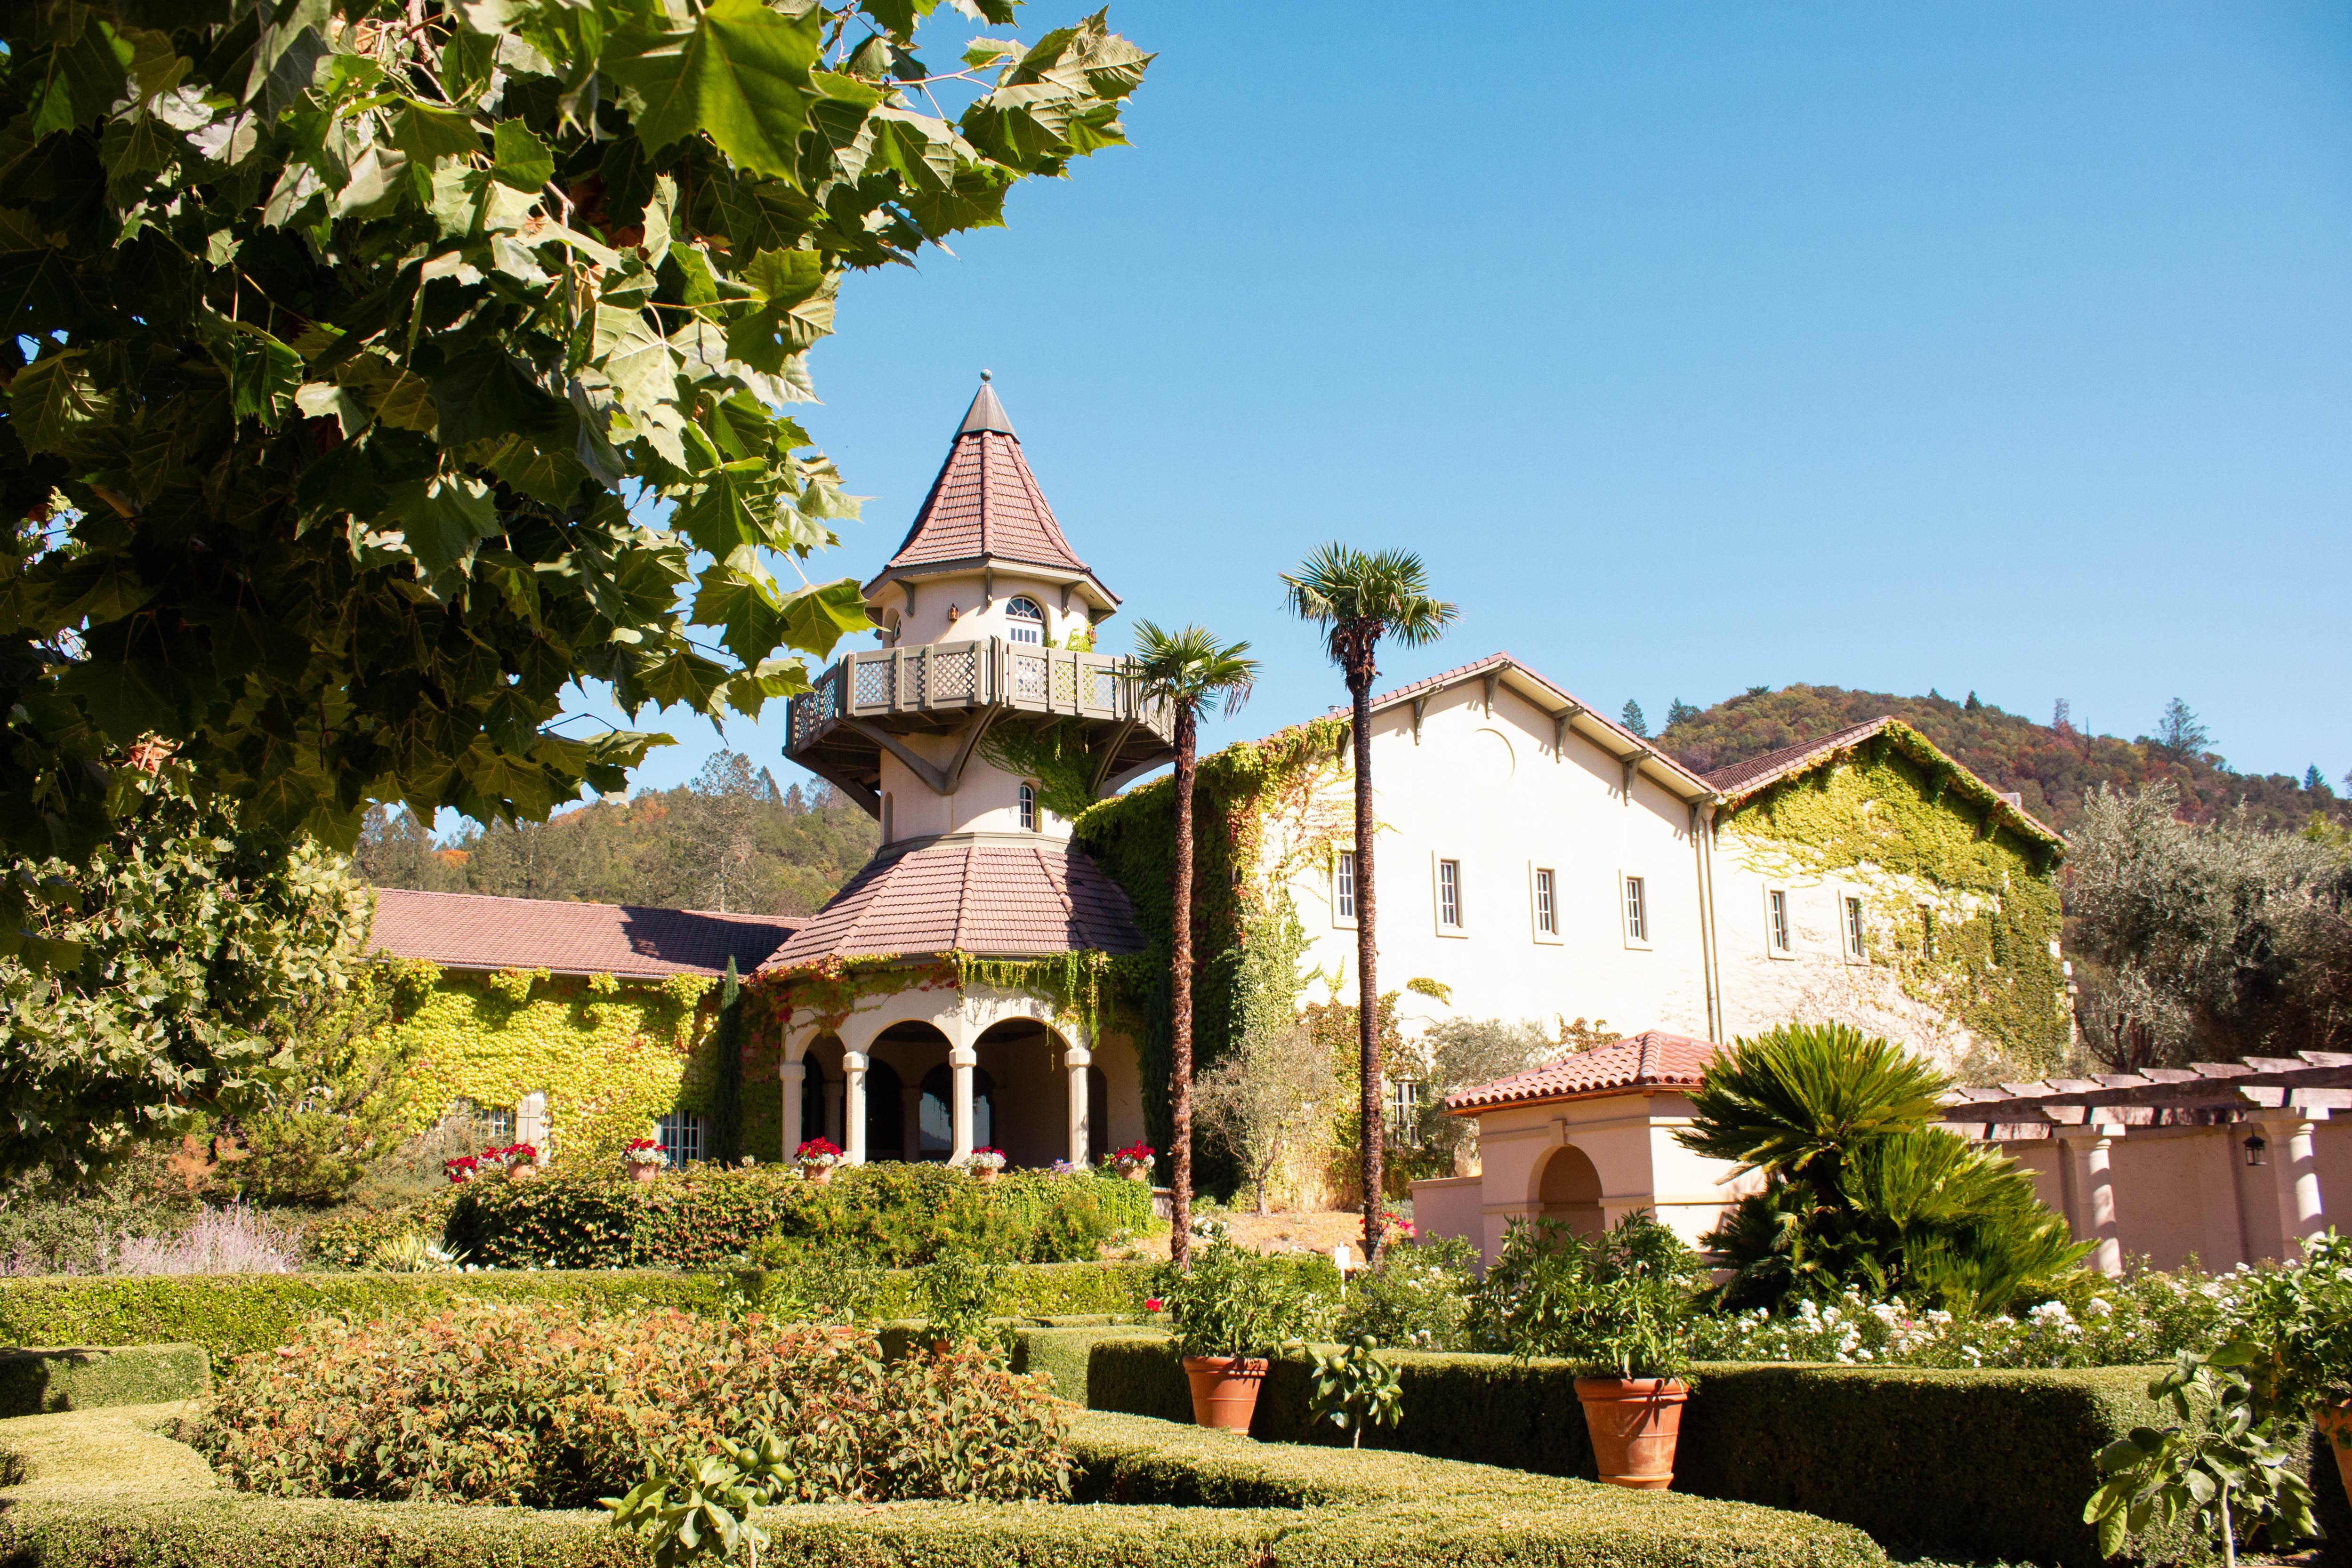 Chateau St. Jean, Sonoma County, California